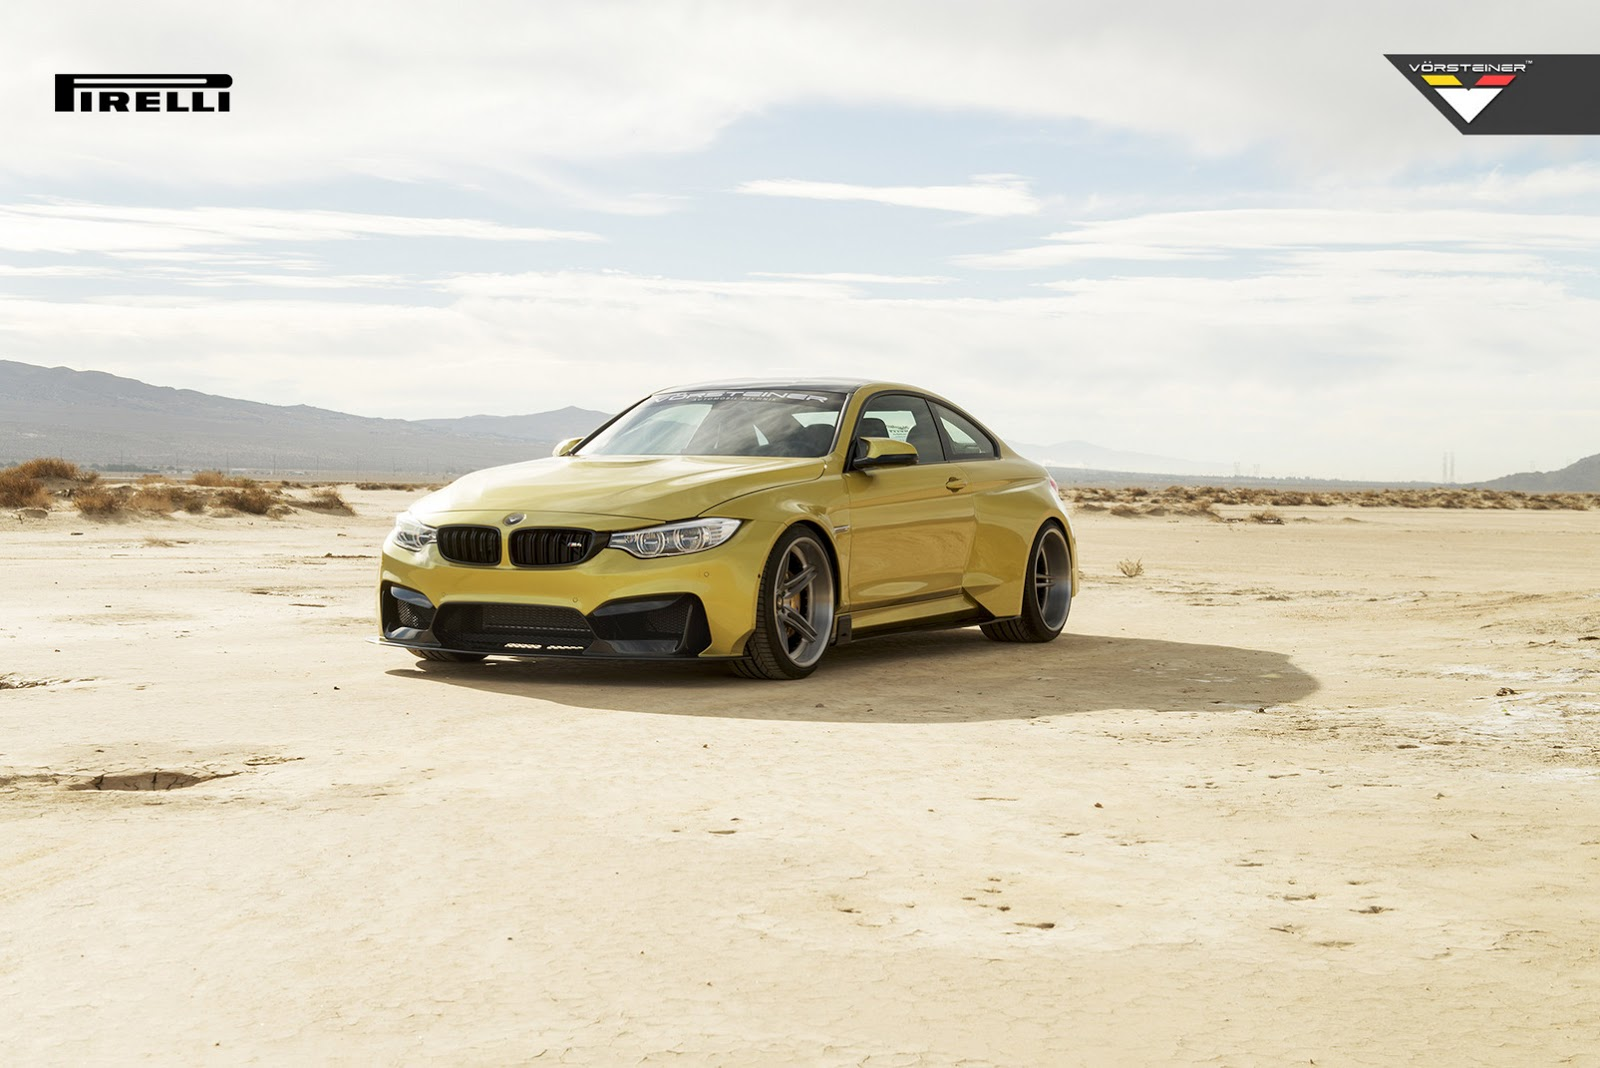 http://1.bp.blogspot.com/-RwqSsUxbgSQ/VHOheEMMlVI/AAAAAAAAdBY/0Oh_OcWjrTo/s1600/BMW-M4-GTRS4-22.jpg